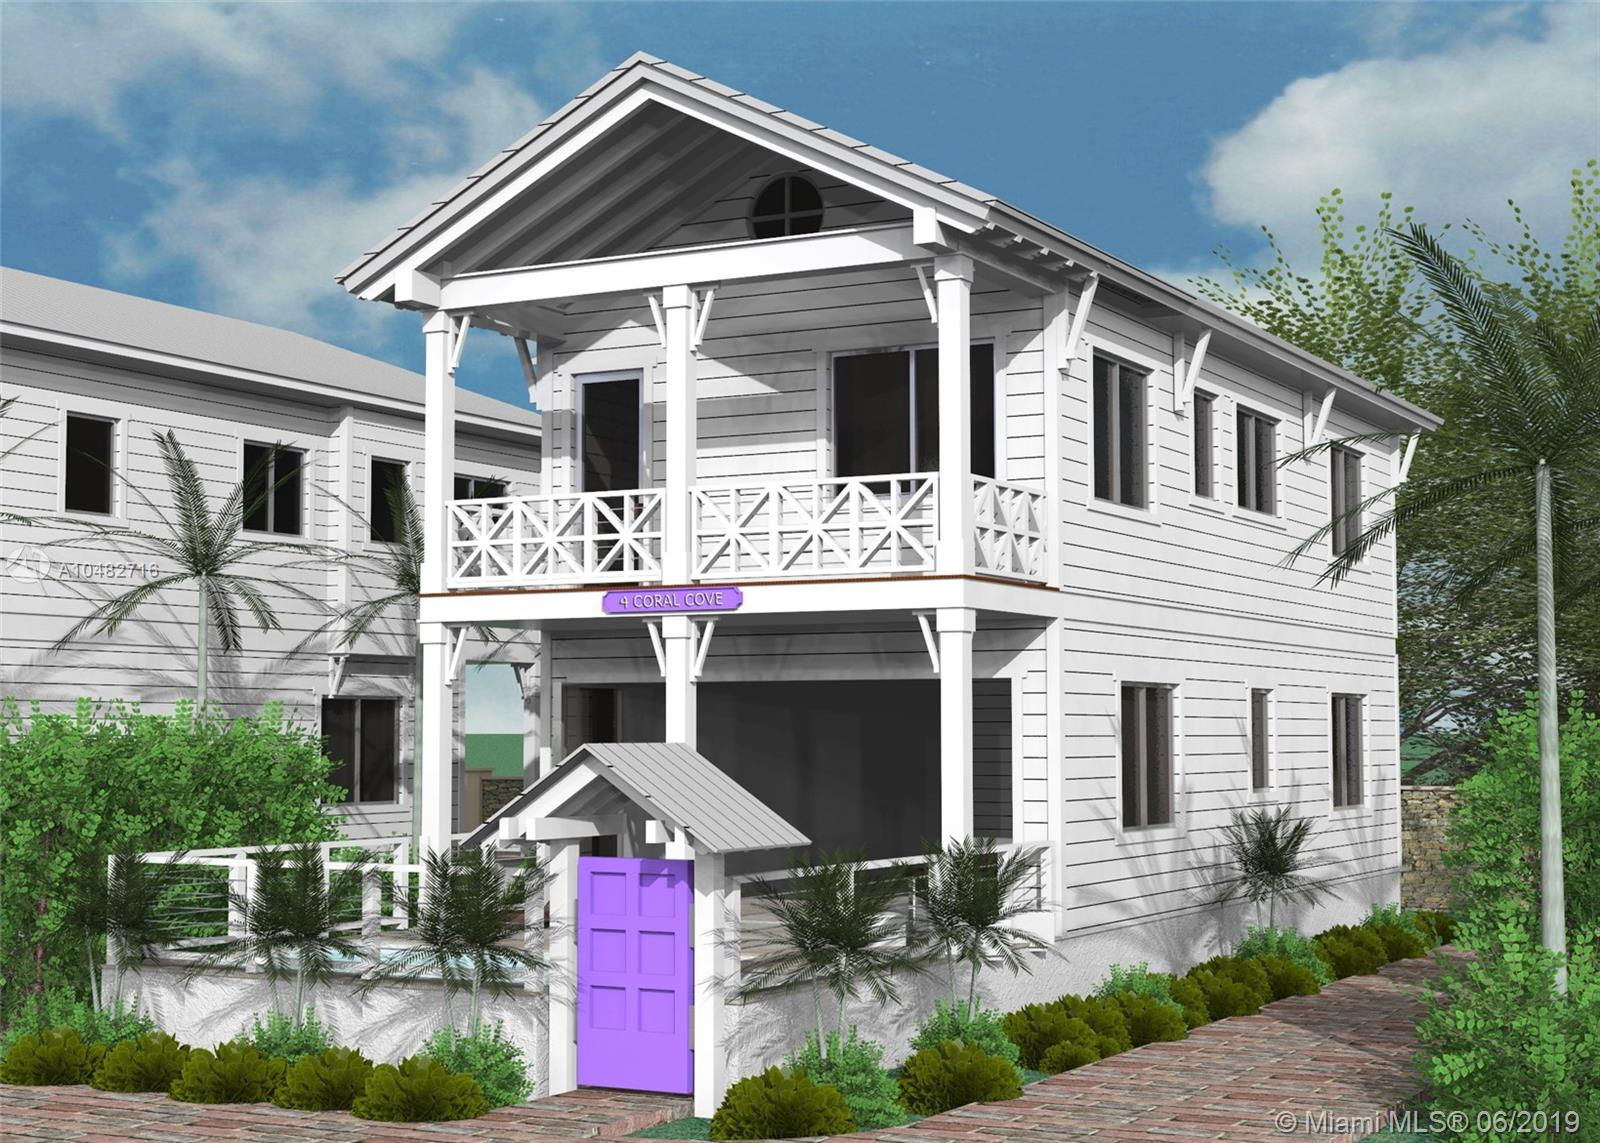 81906 #7 Overseas, Other City - Keys/Islands/Caribbean, FL 33036